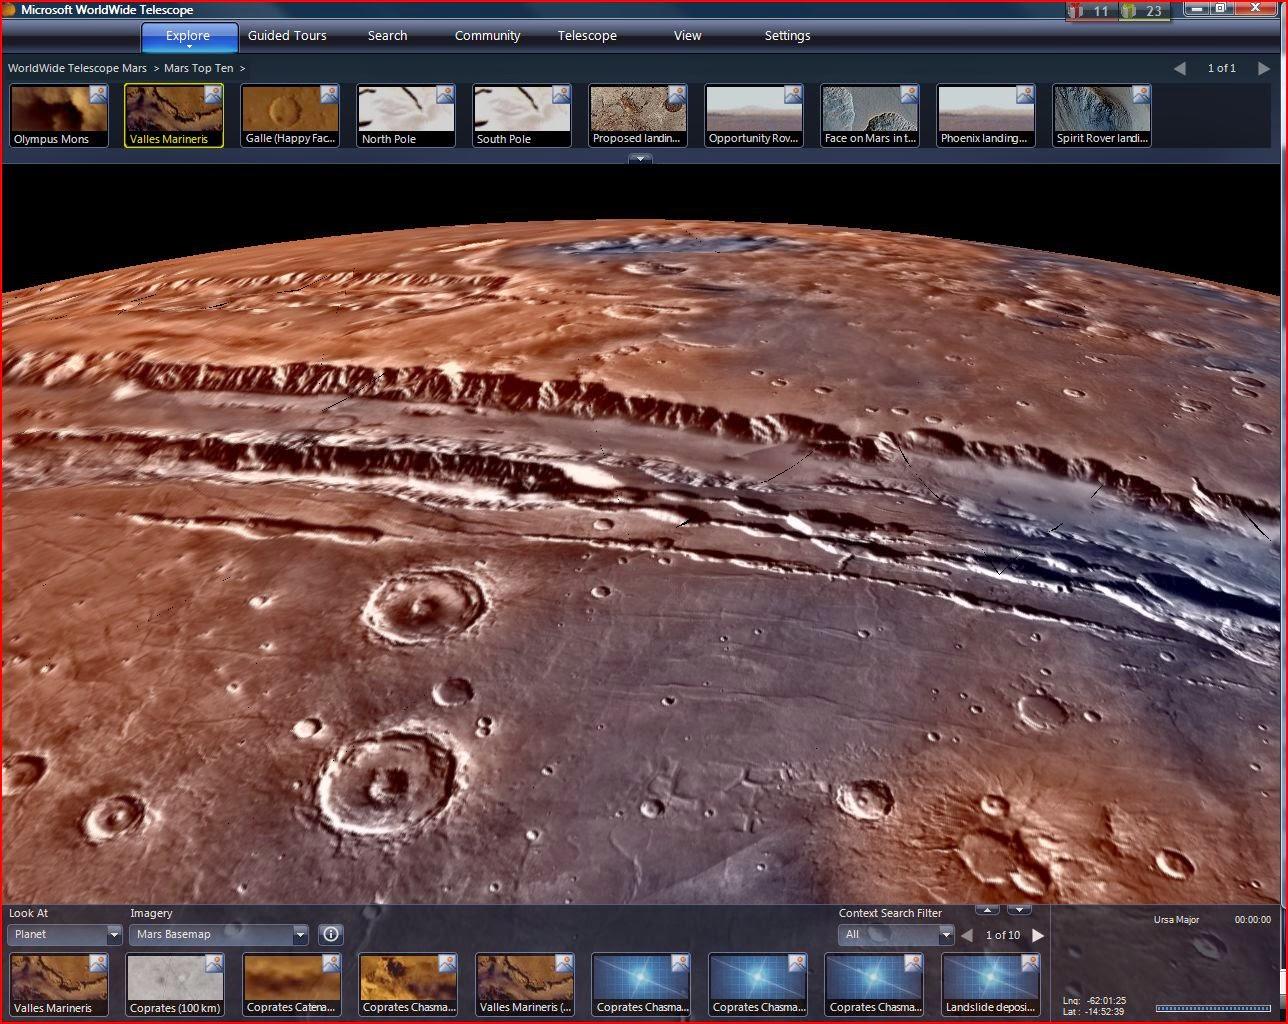 Microsoft WorldWide Telescope 3.0.60.1 Layerscape Beta